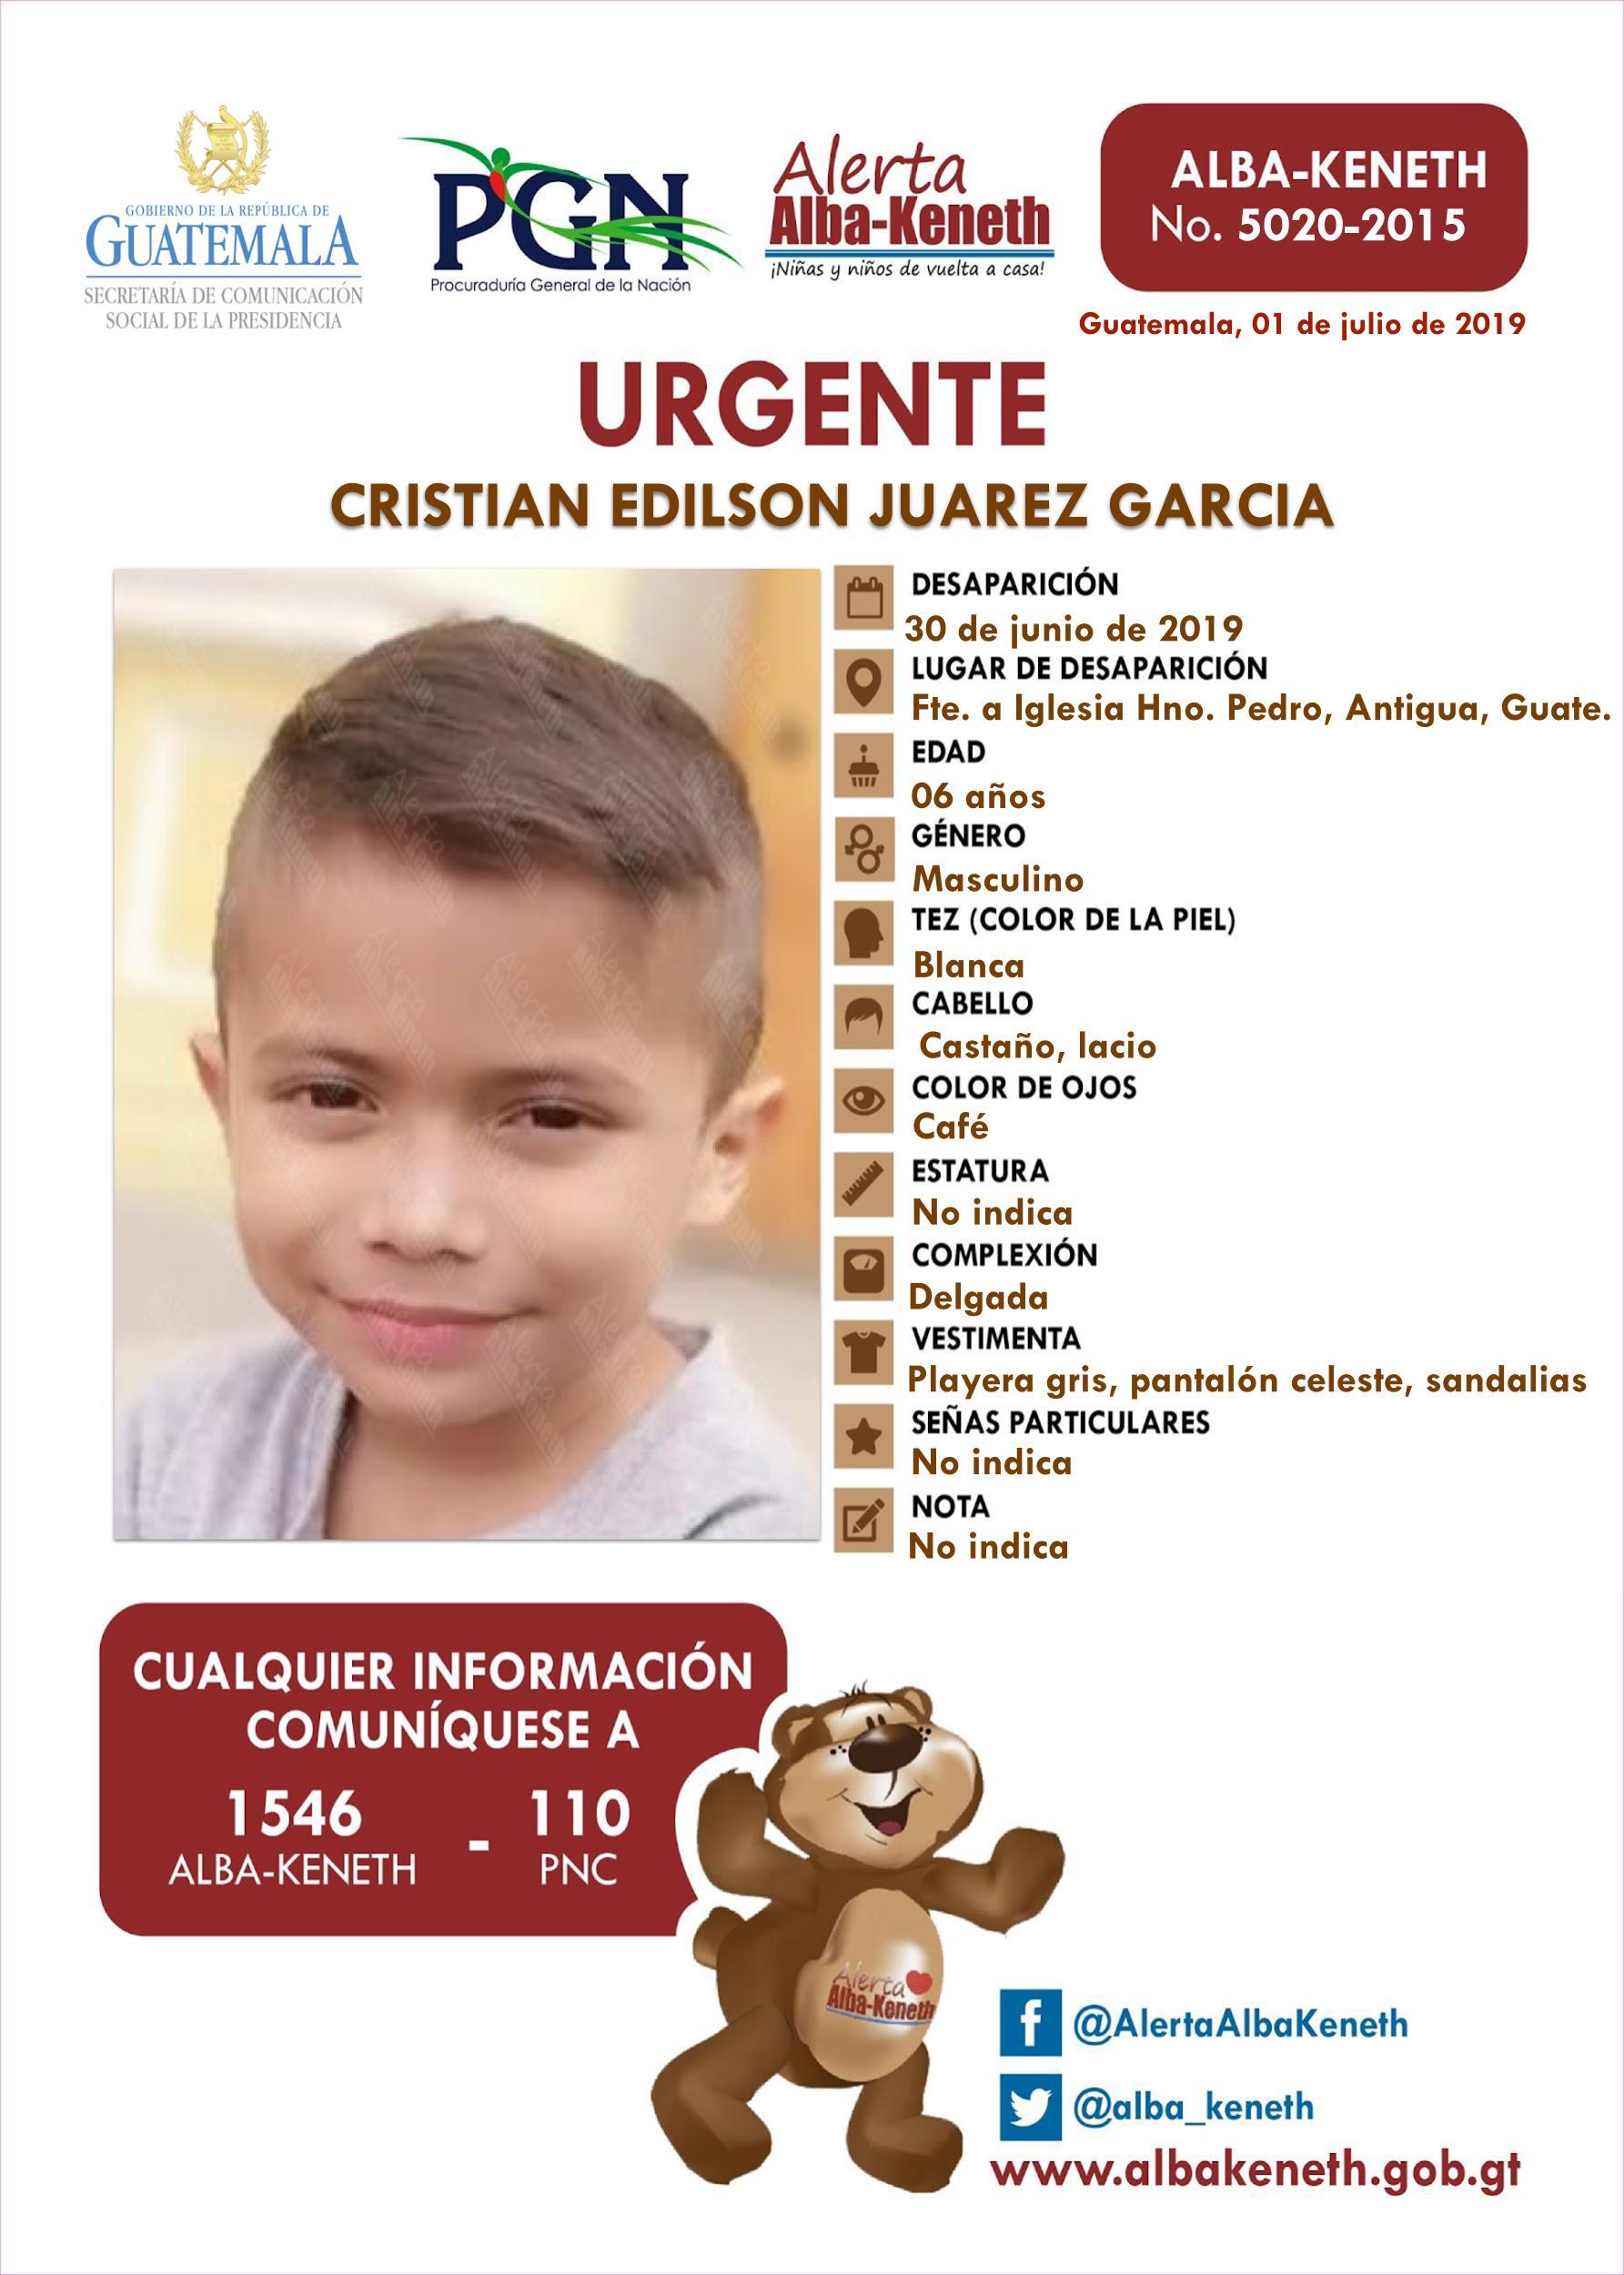 Cristian Edilson Juarez Garcia